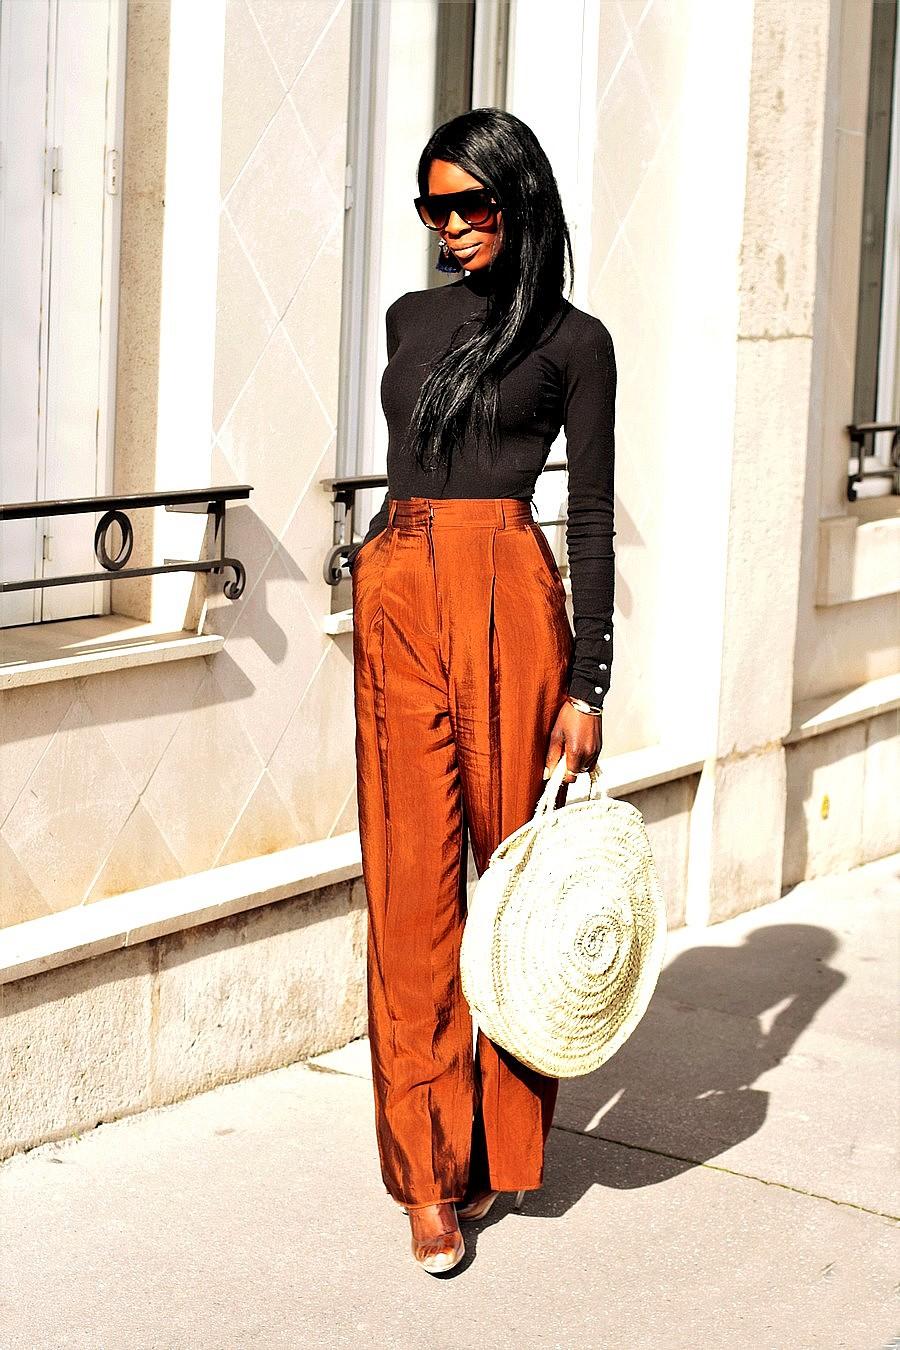 sac-panier-rond-paille-tendance-mode-blog-instagram